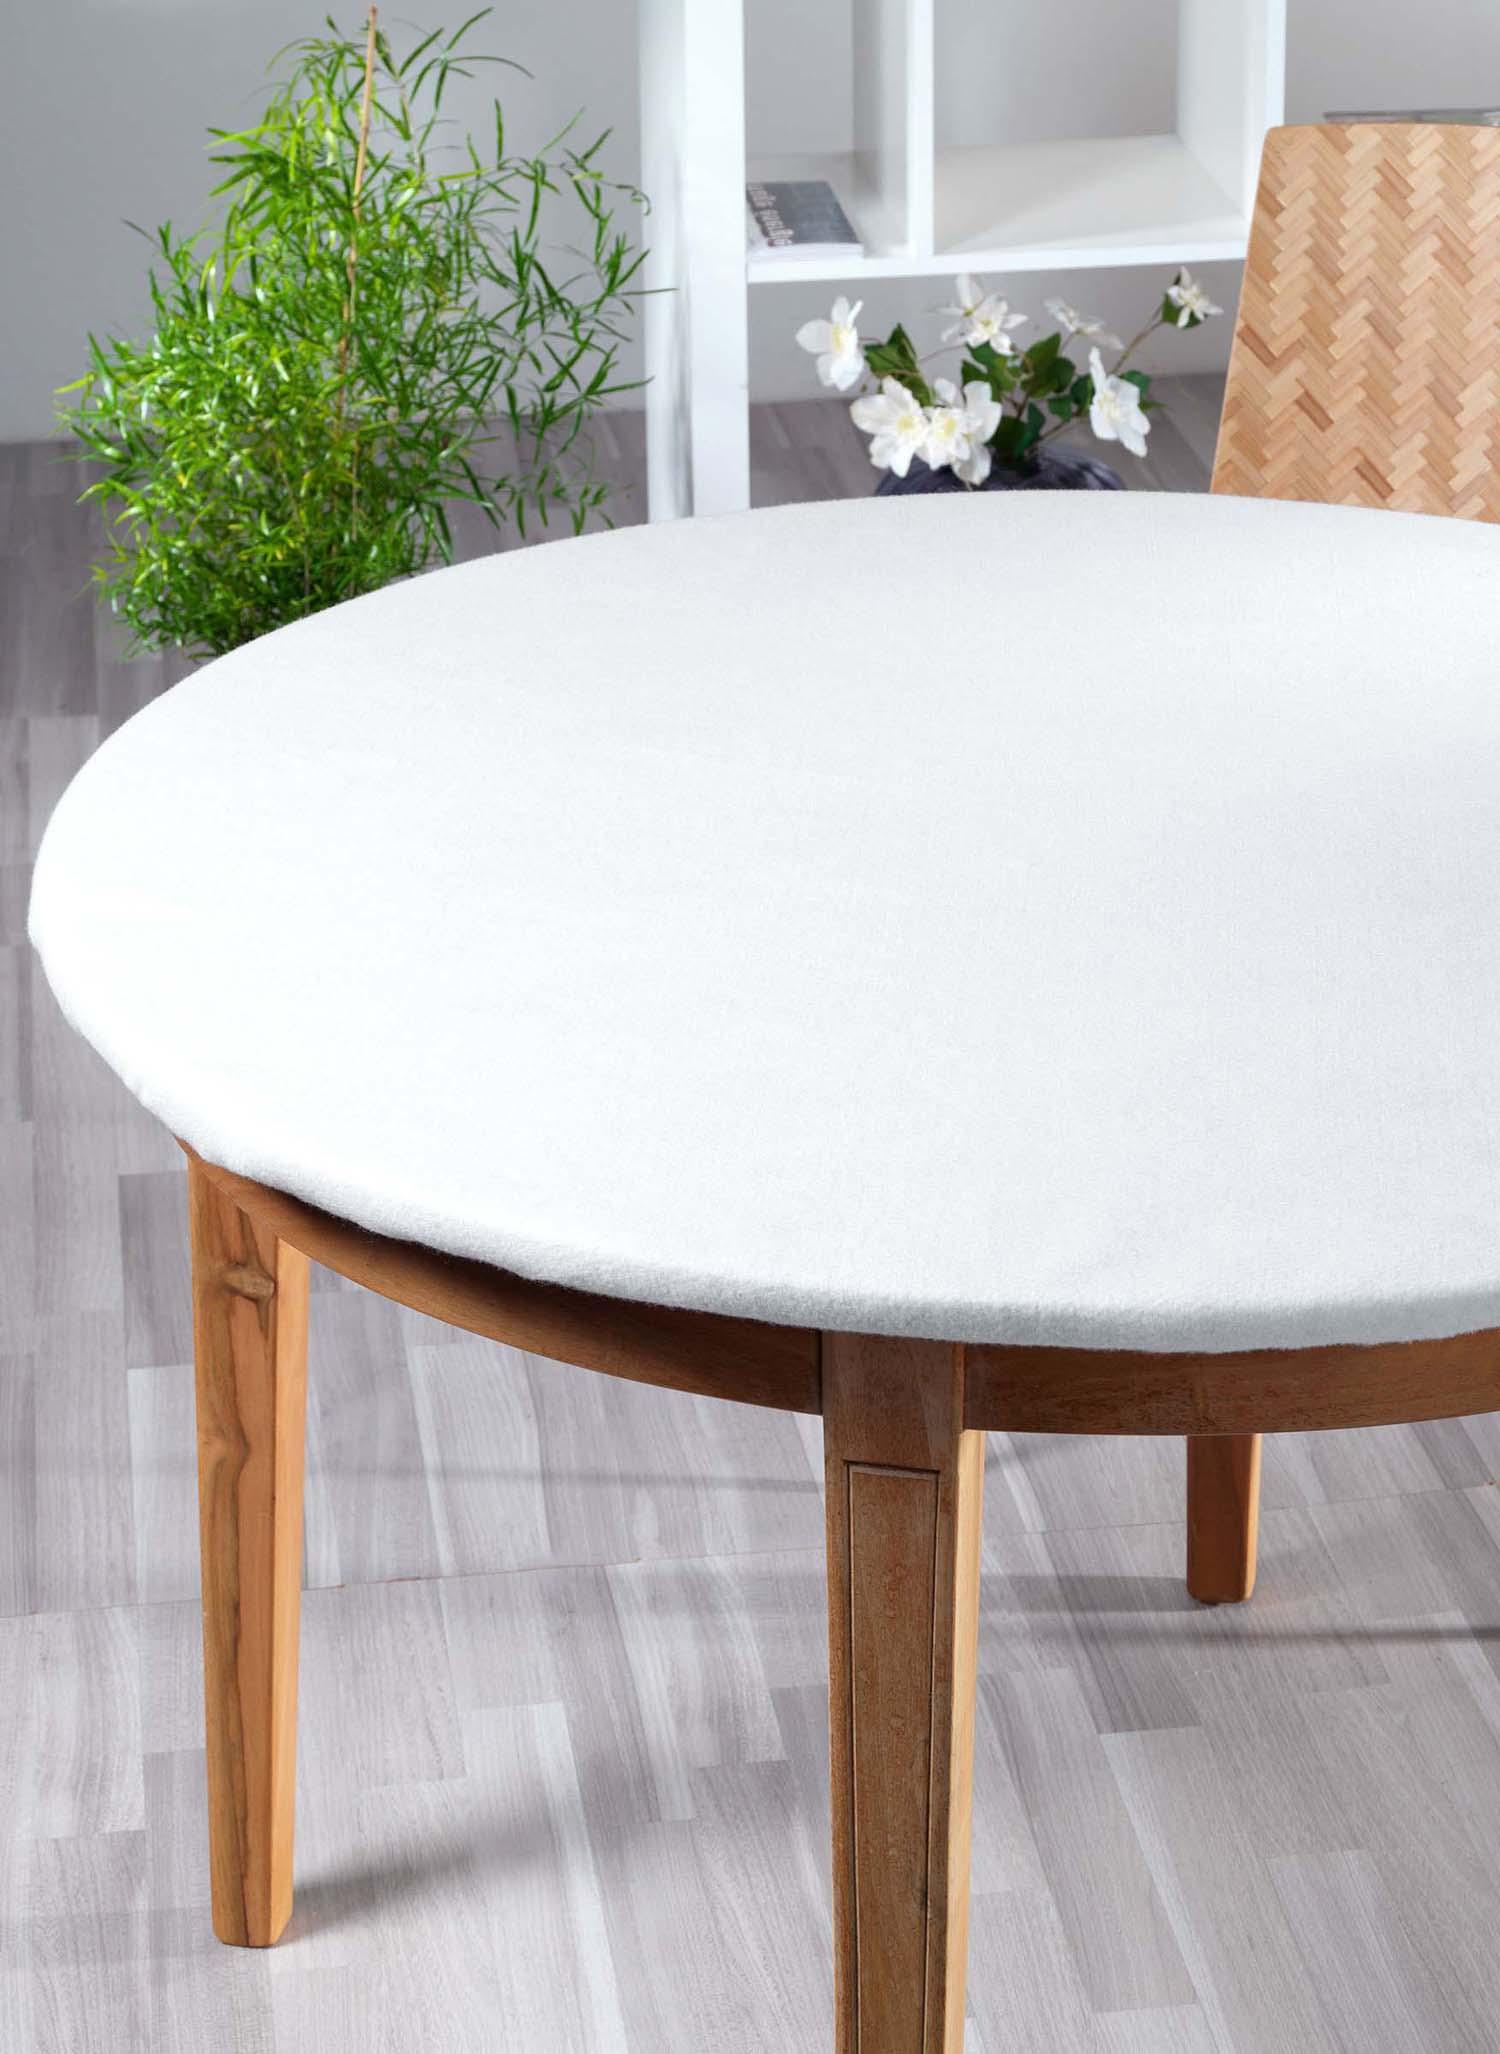 Mollettone per tavolo - Mollettone per tavolo ...